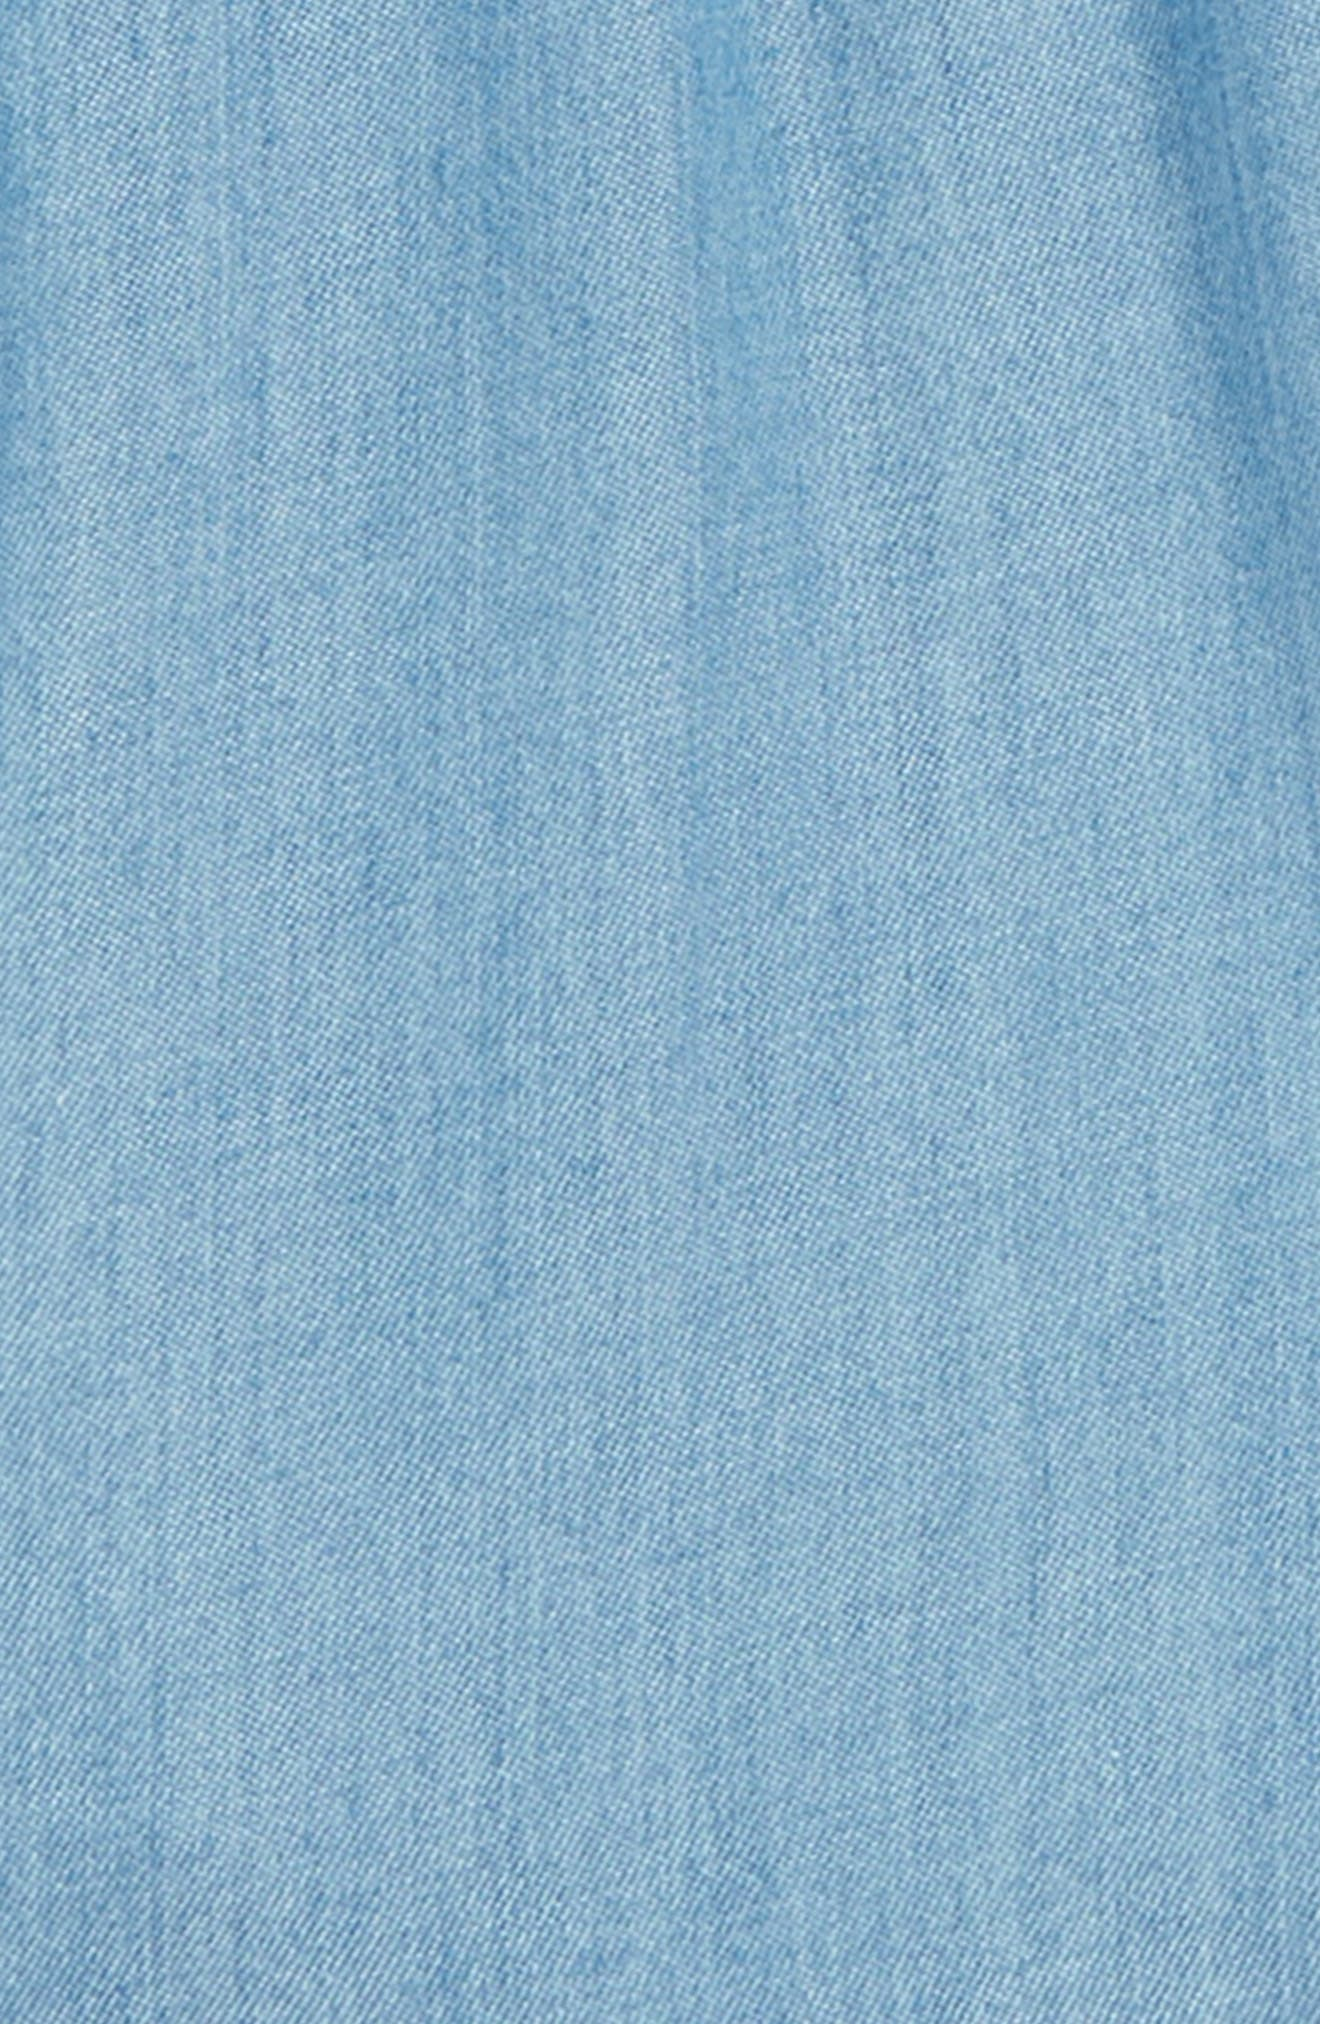 Ruffle Chambray Shorts,                             Alternate thumbnail 2, color,                             420